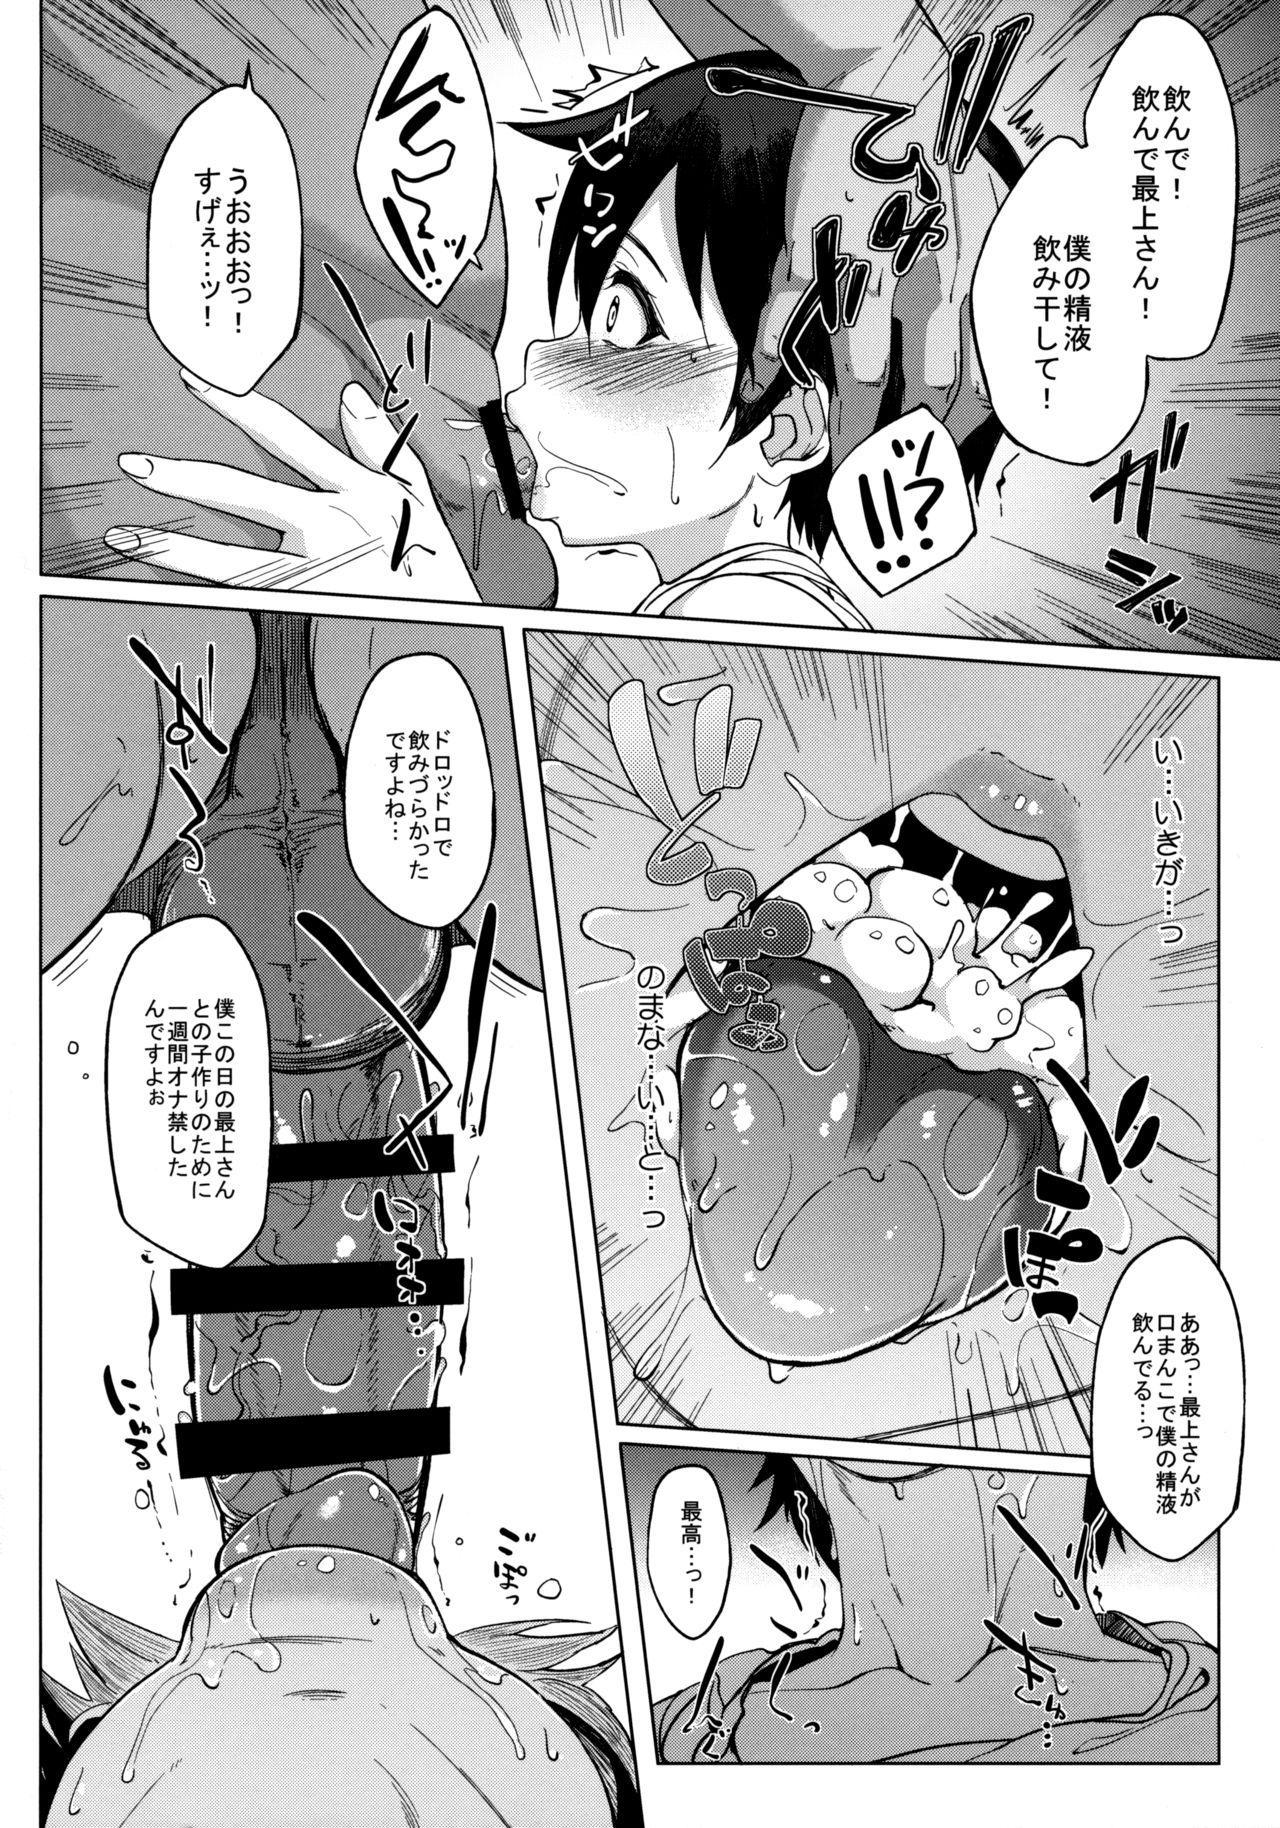 Juujunyoukan Mogami 9